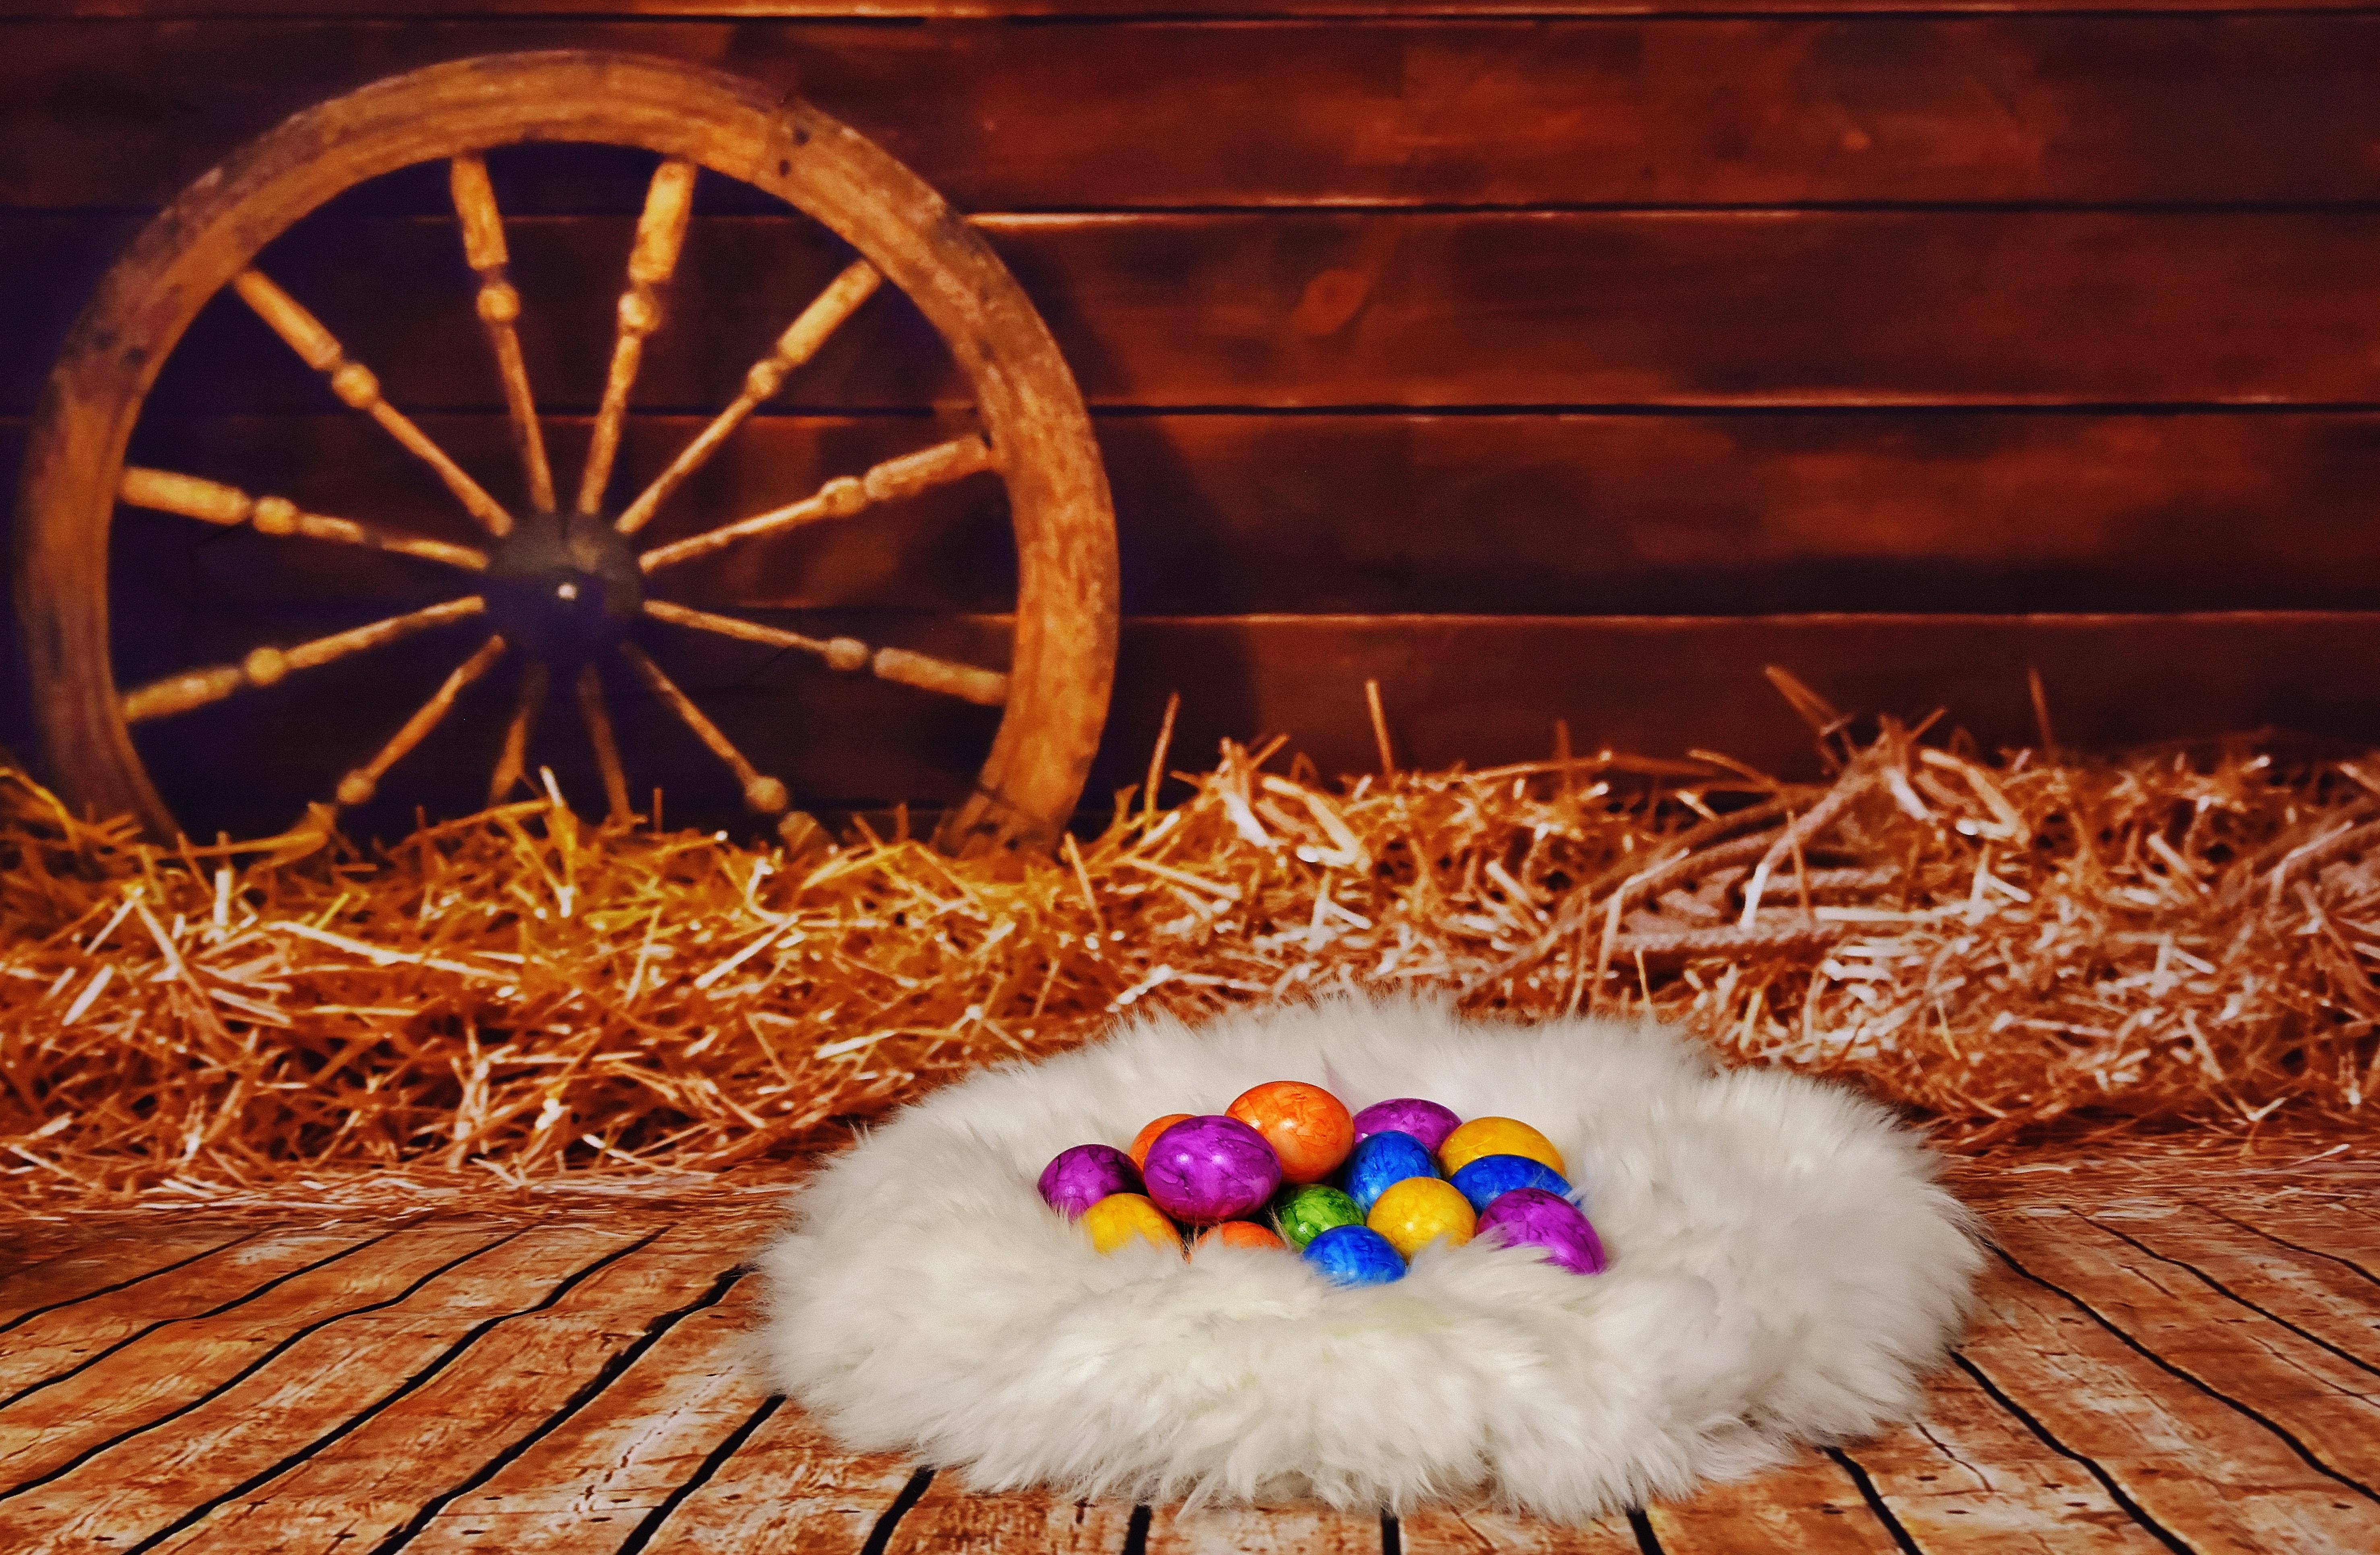 94912 descargar fondo de pantalla Vacaciones, Nido, Heno, Pascua, Huevos: protectores de pantalla e imágenes gratis